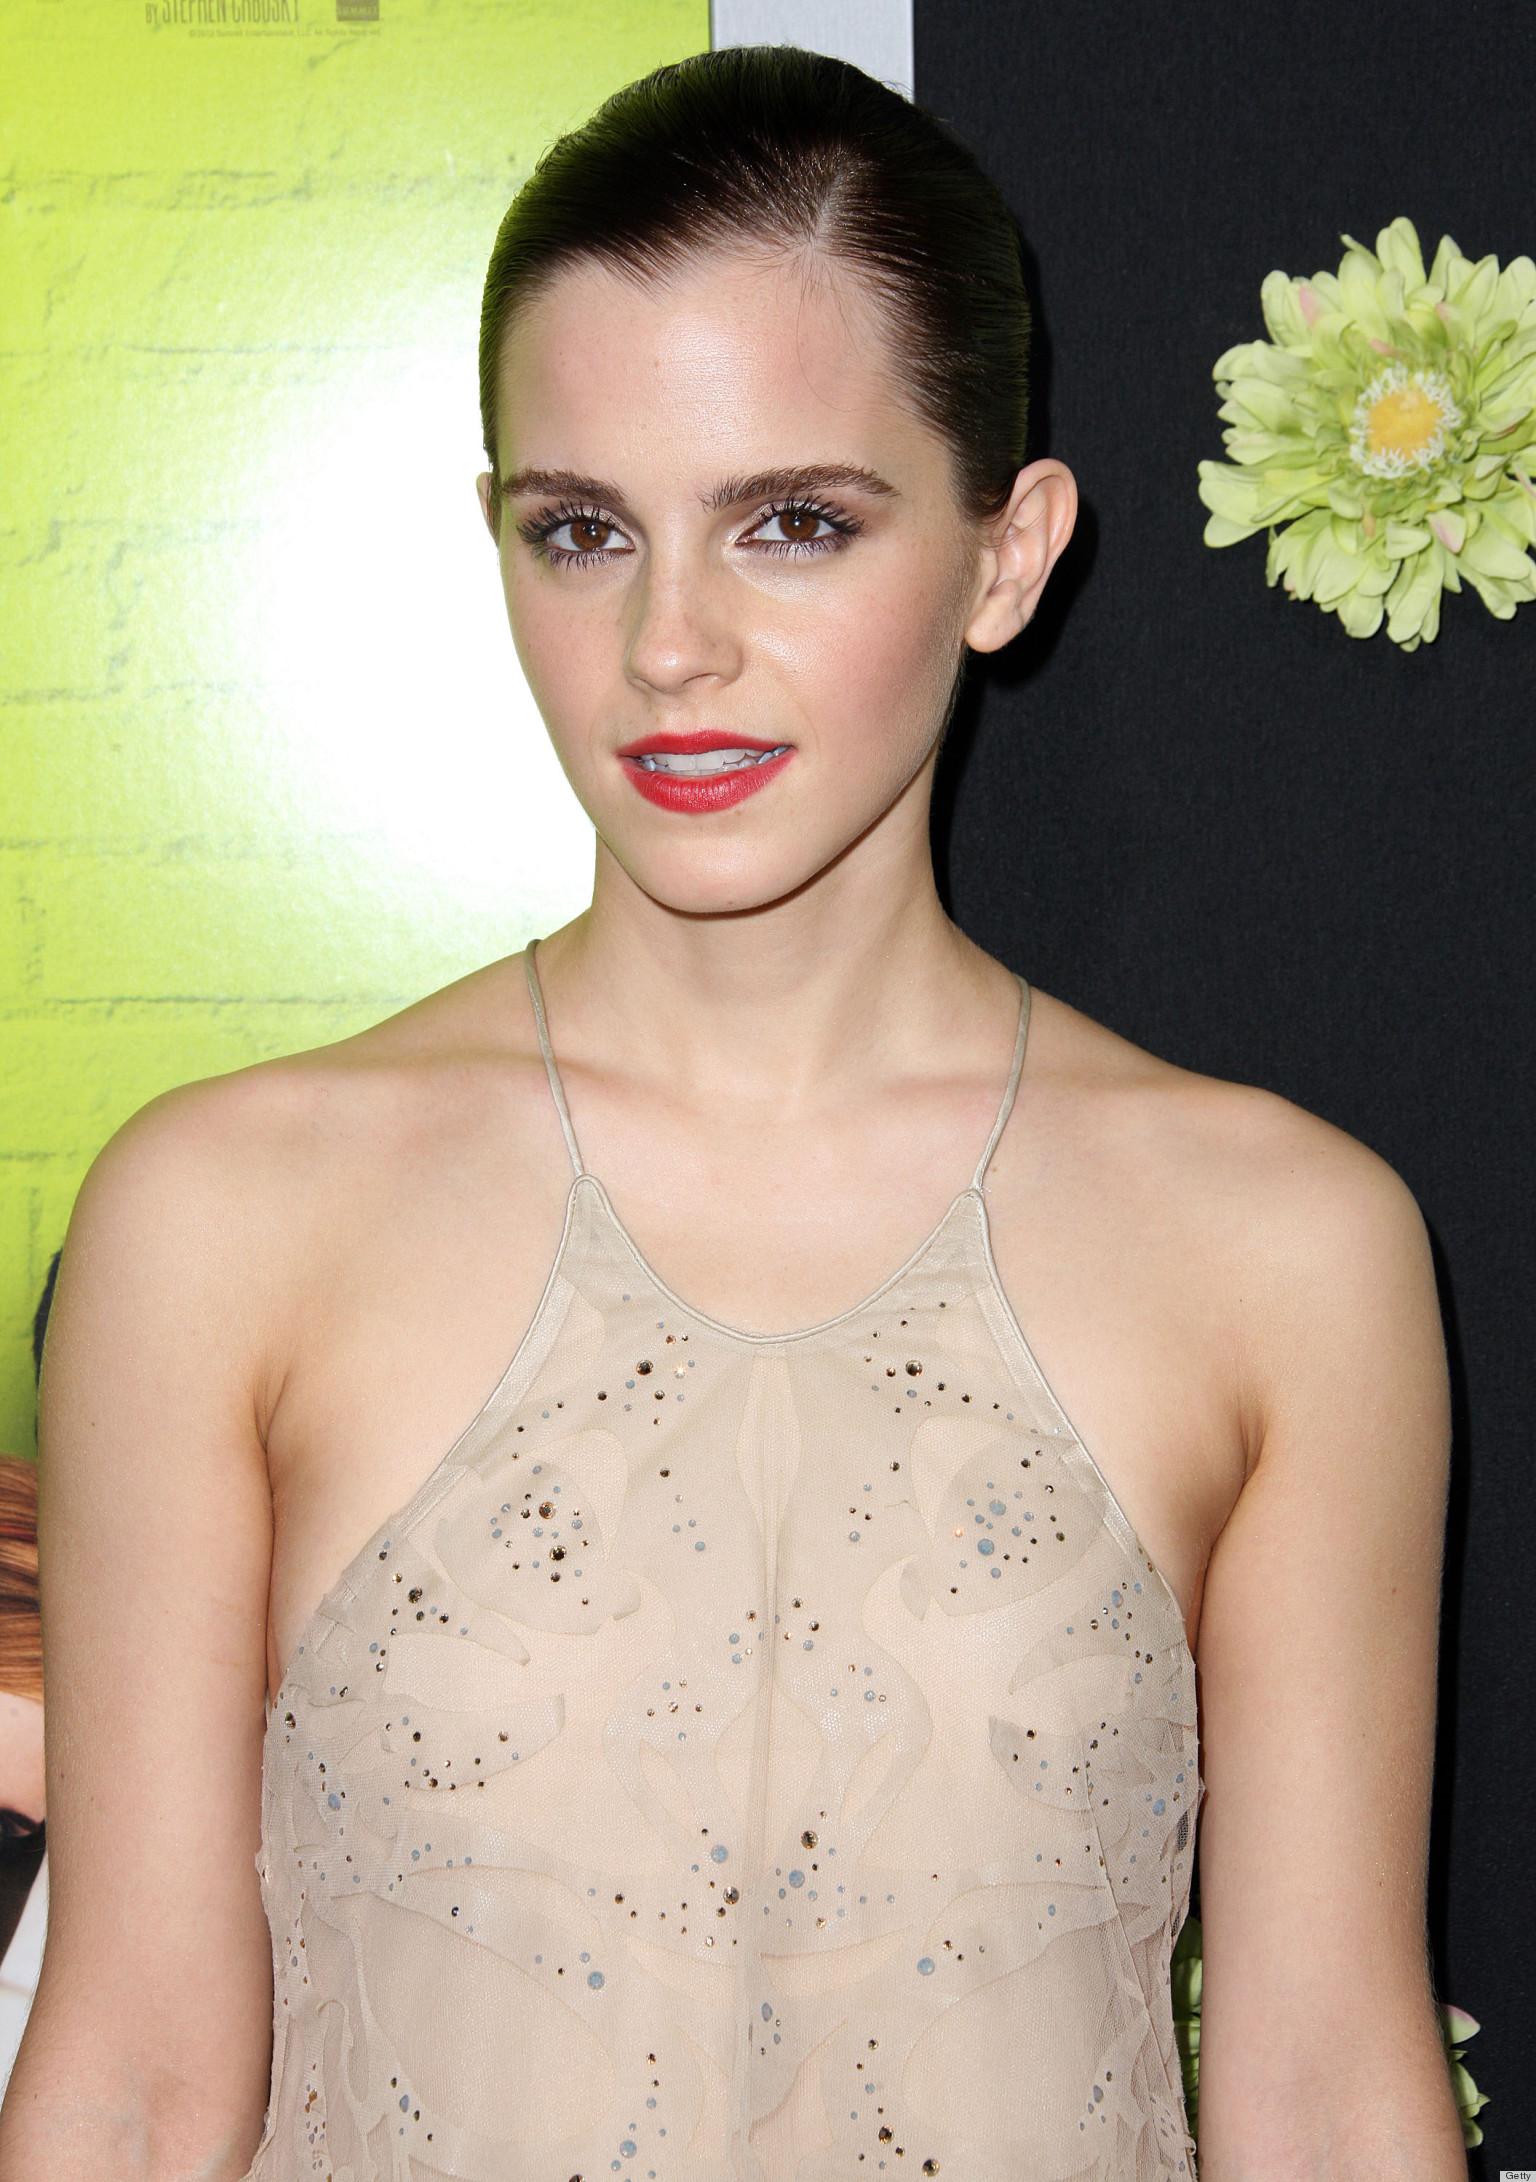 Emma Watson Wardrobe Malfunction Actress Suffers From Too